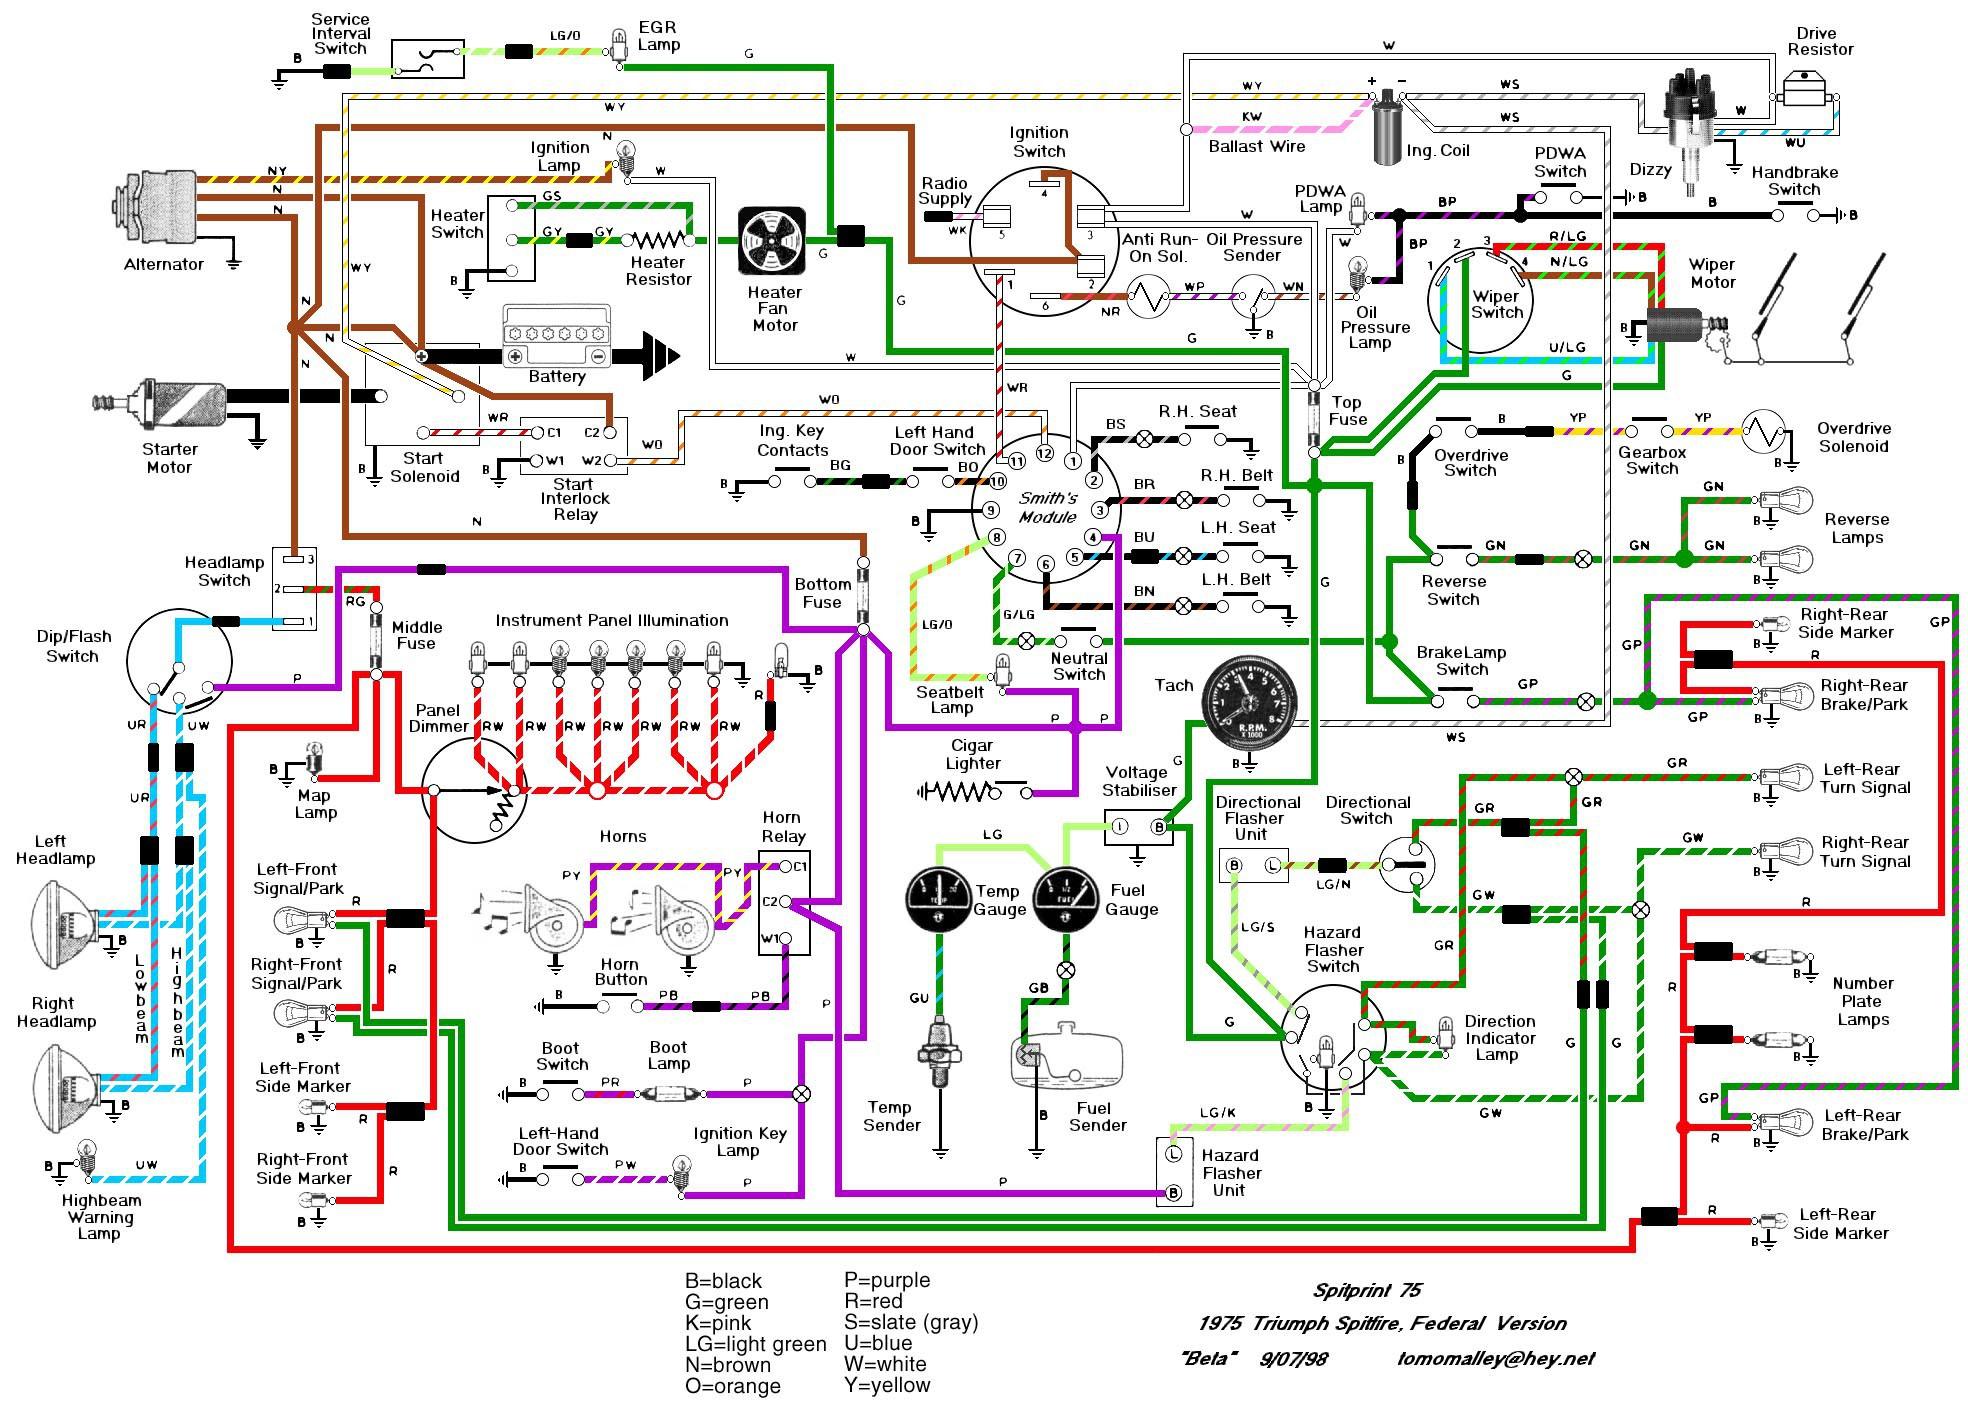 ez wire fuse panel diagram - source wiring diagram ez wiring harness diagram chevy 1957 chevy wiring diagram eva joos